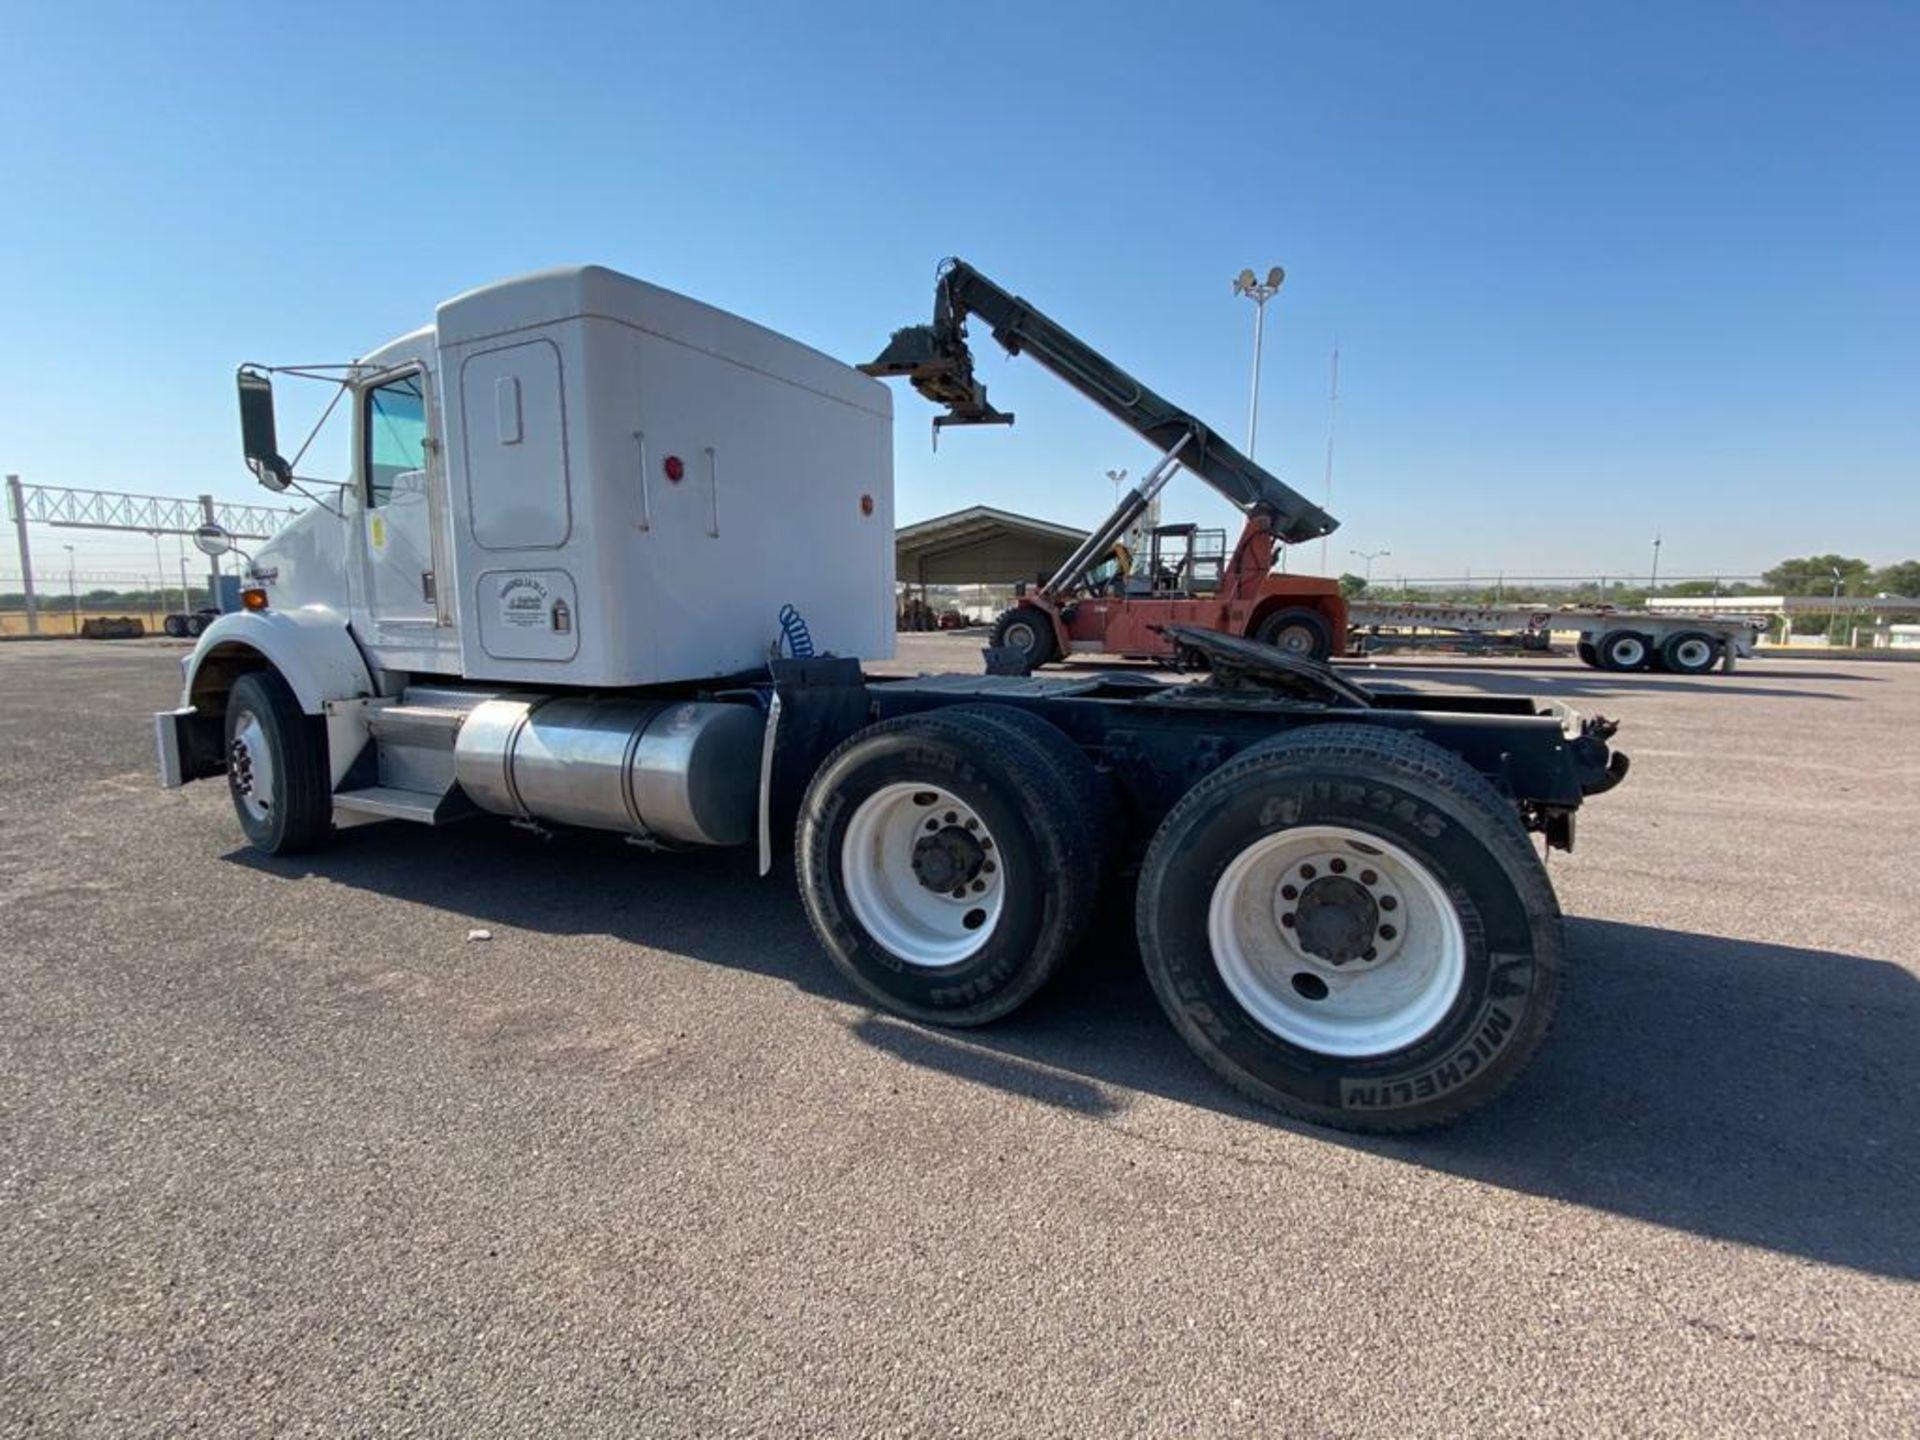 1998 Kenworth Sleeper Truck Tractor, standard transmission of 18 speeds - Image 10 of 55